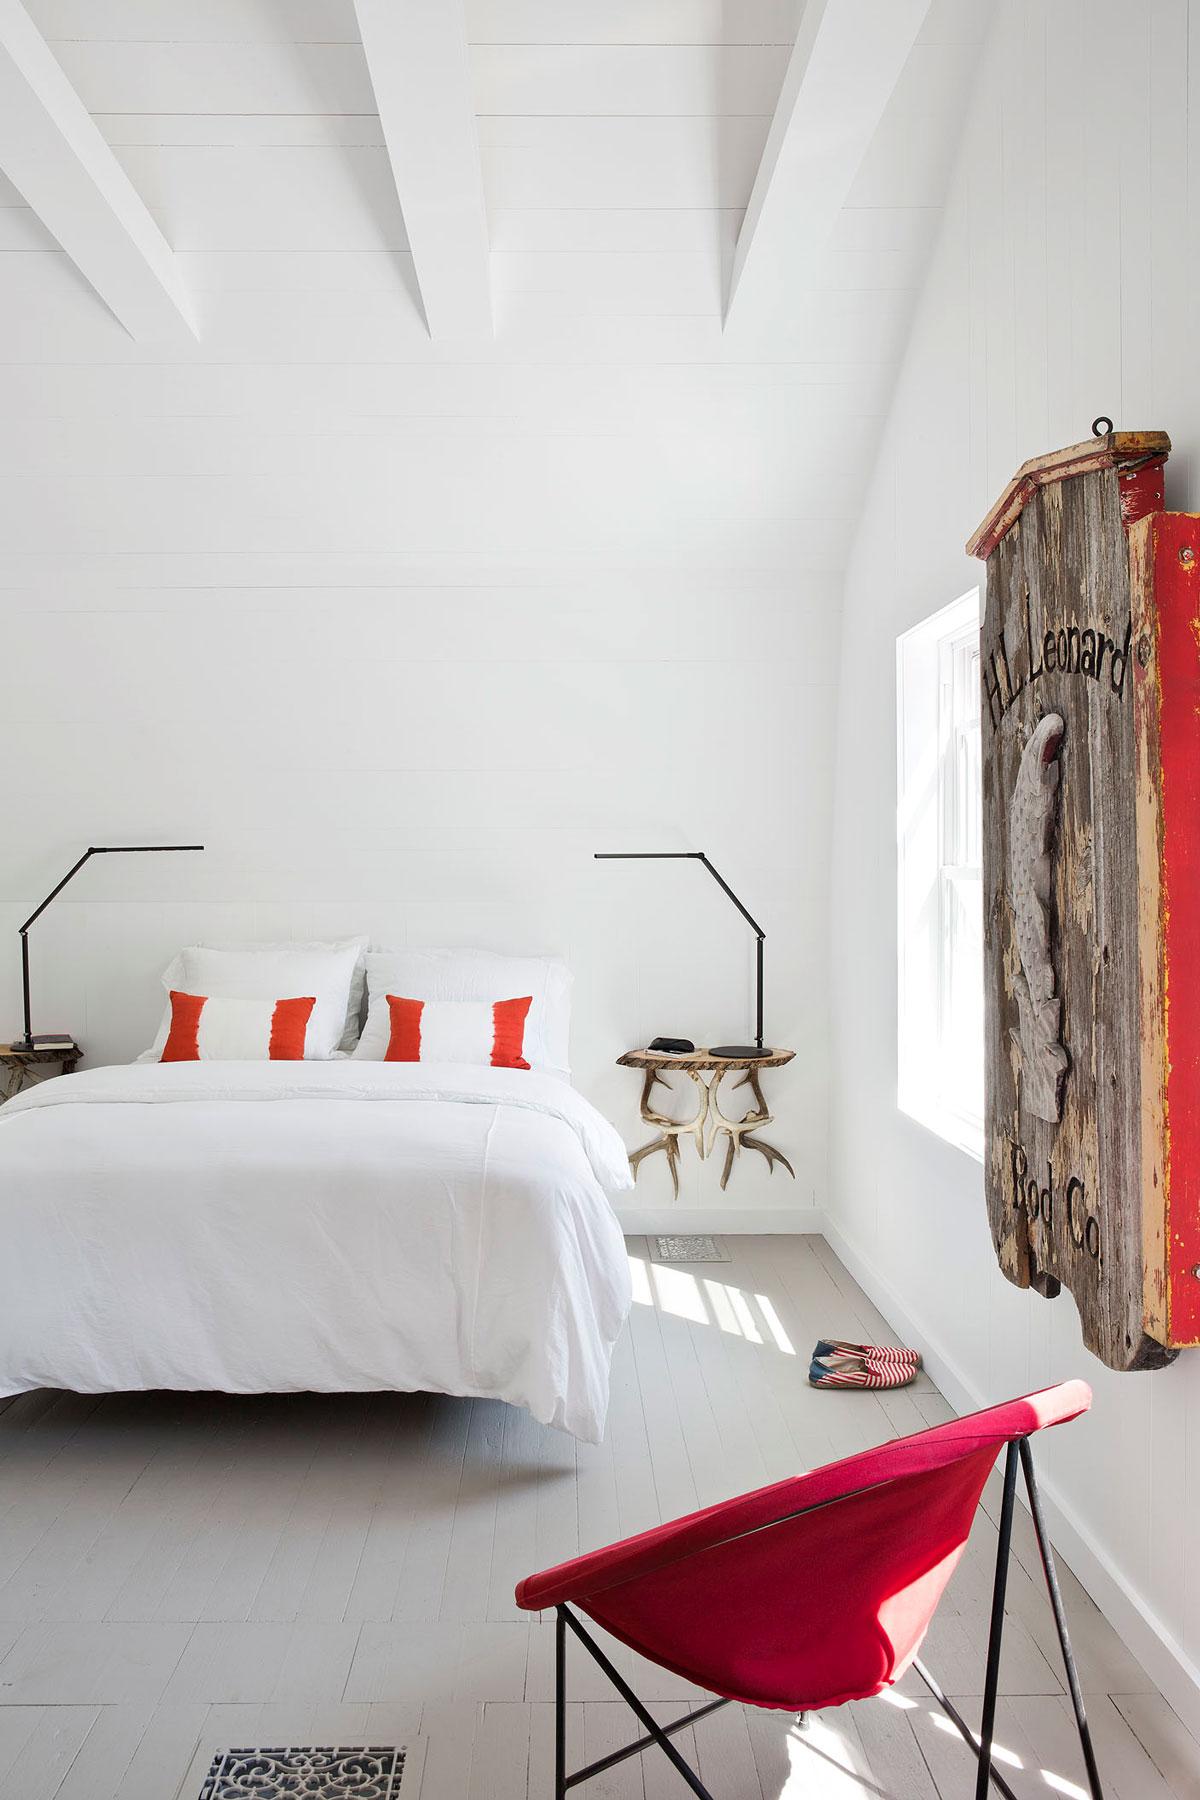 serge-castella-interiors-cottage-adirondaks-01